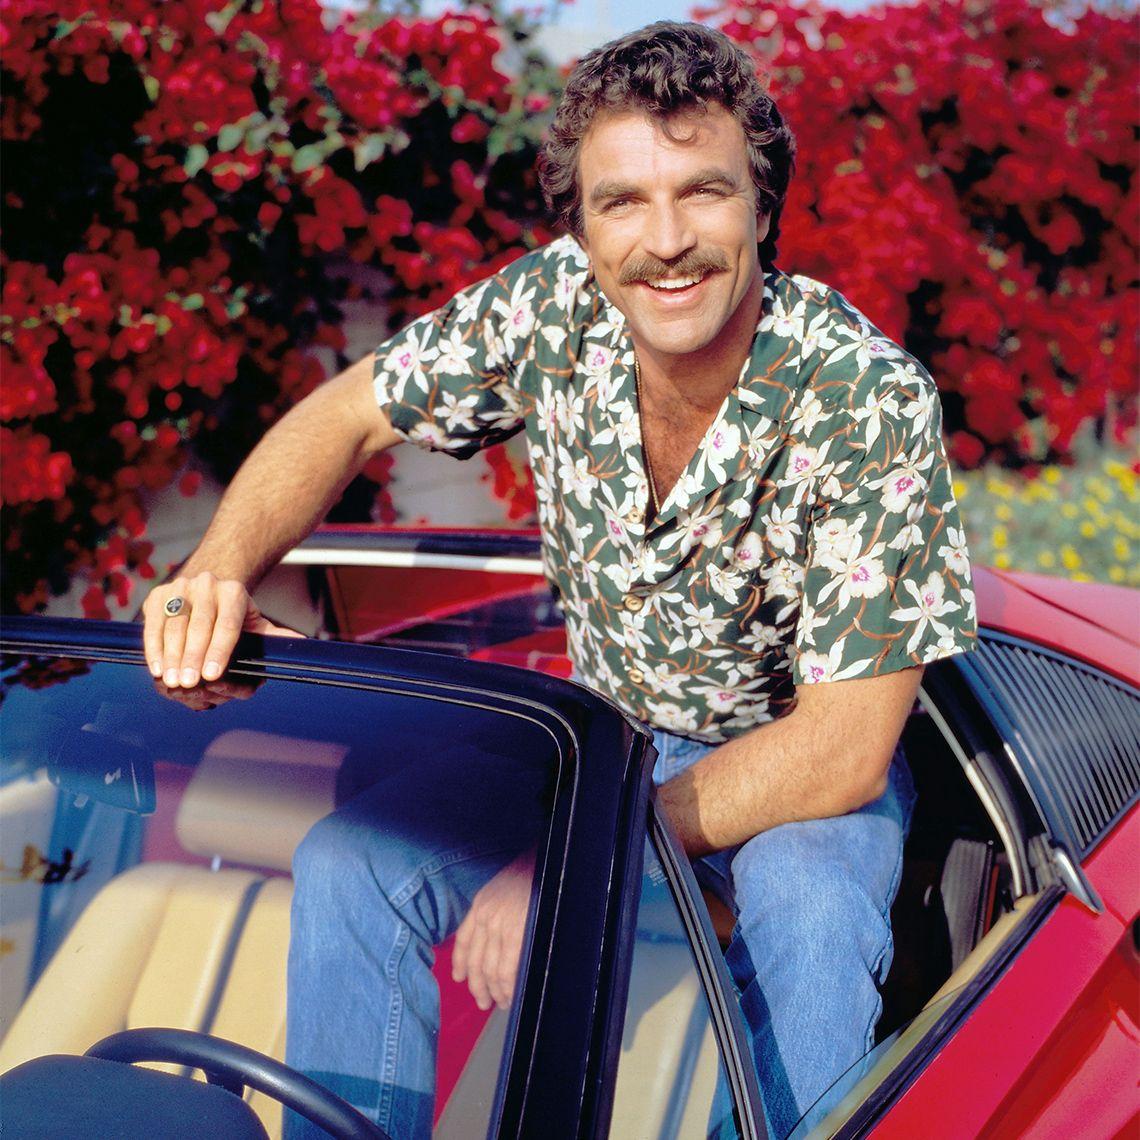 Tom Sellect wearing a Hawaiian shirt